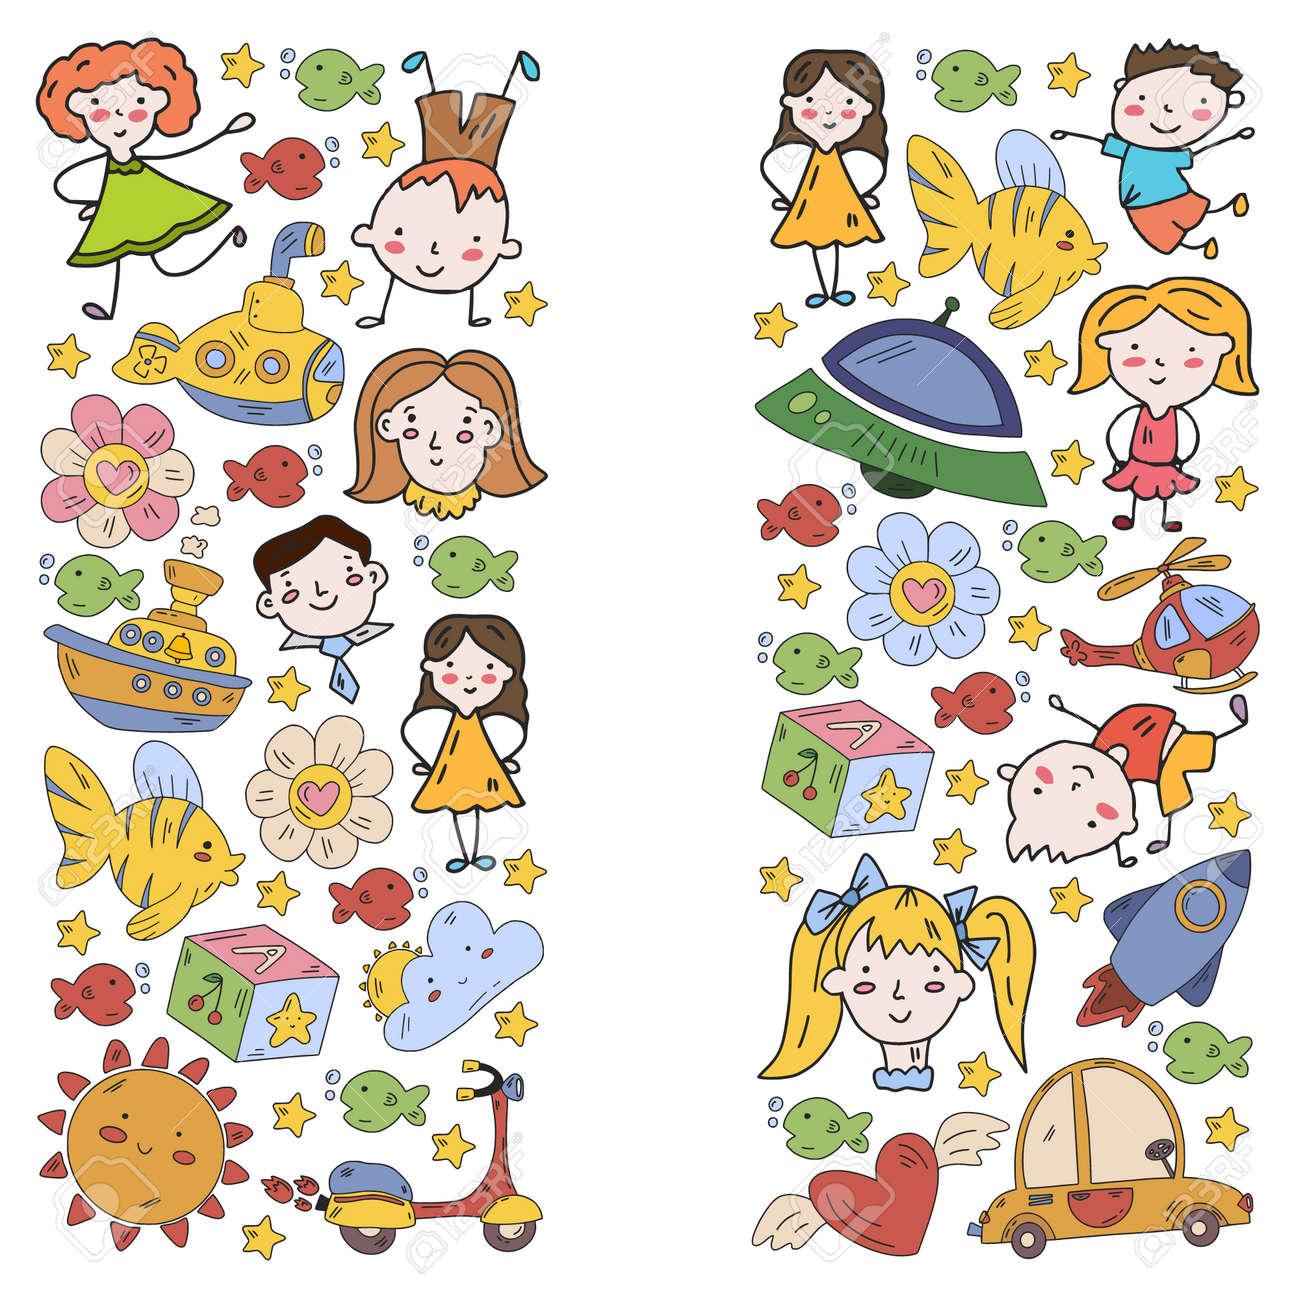 Children play with toys in the kindergarten. Kids playground. Education, creativity, imagination. - 173211516